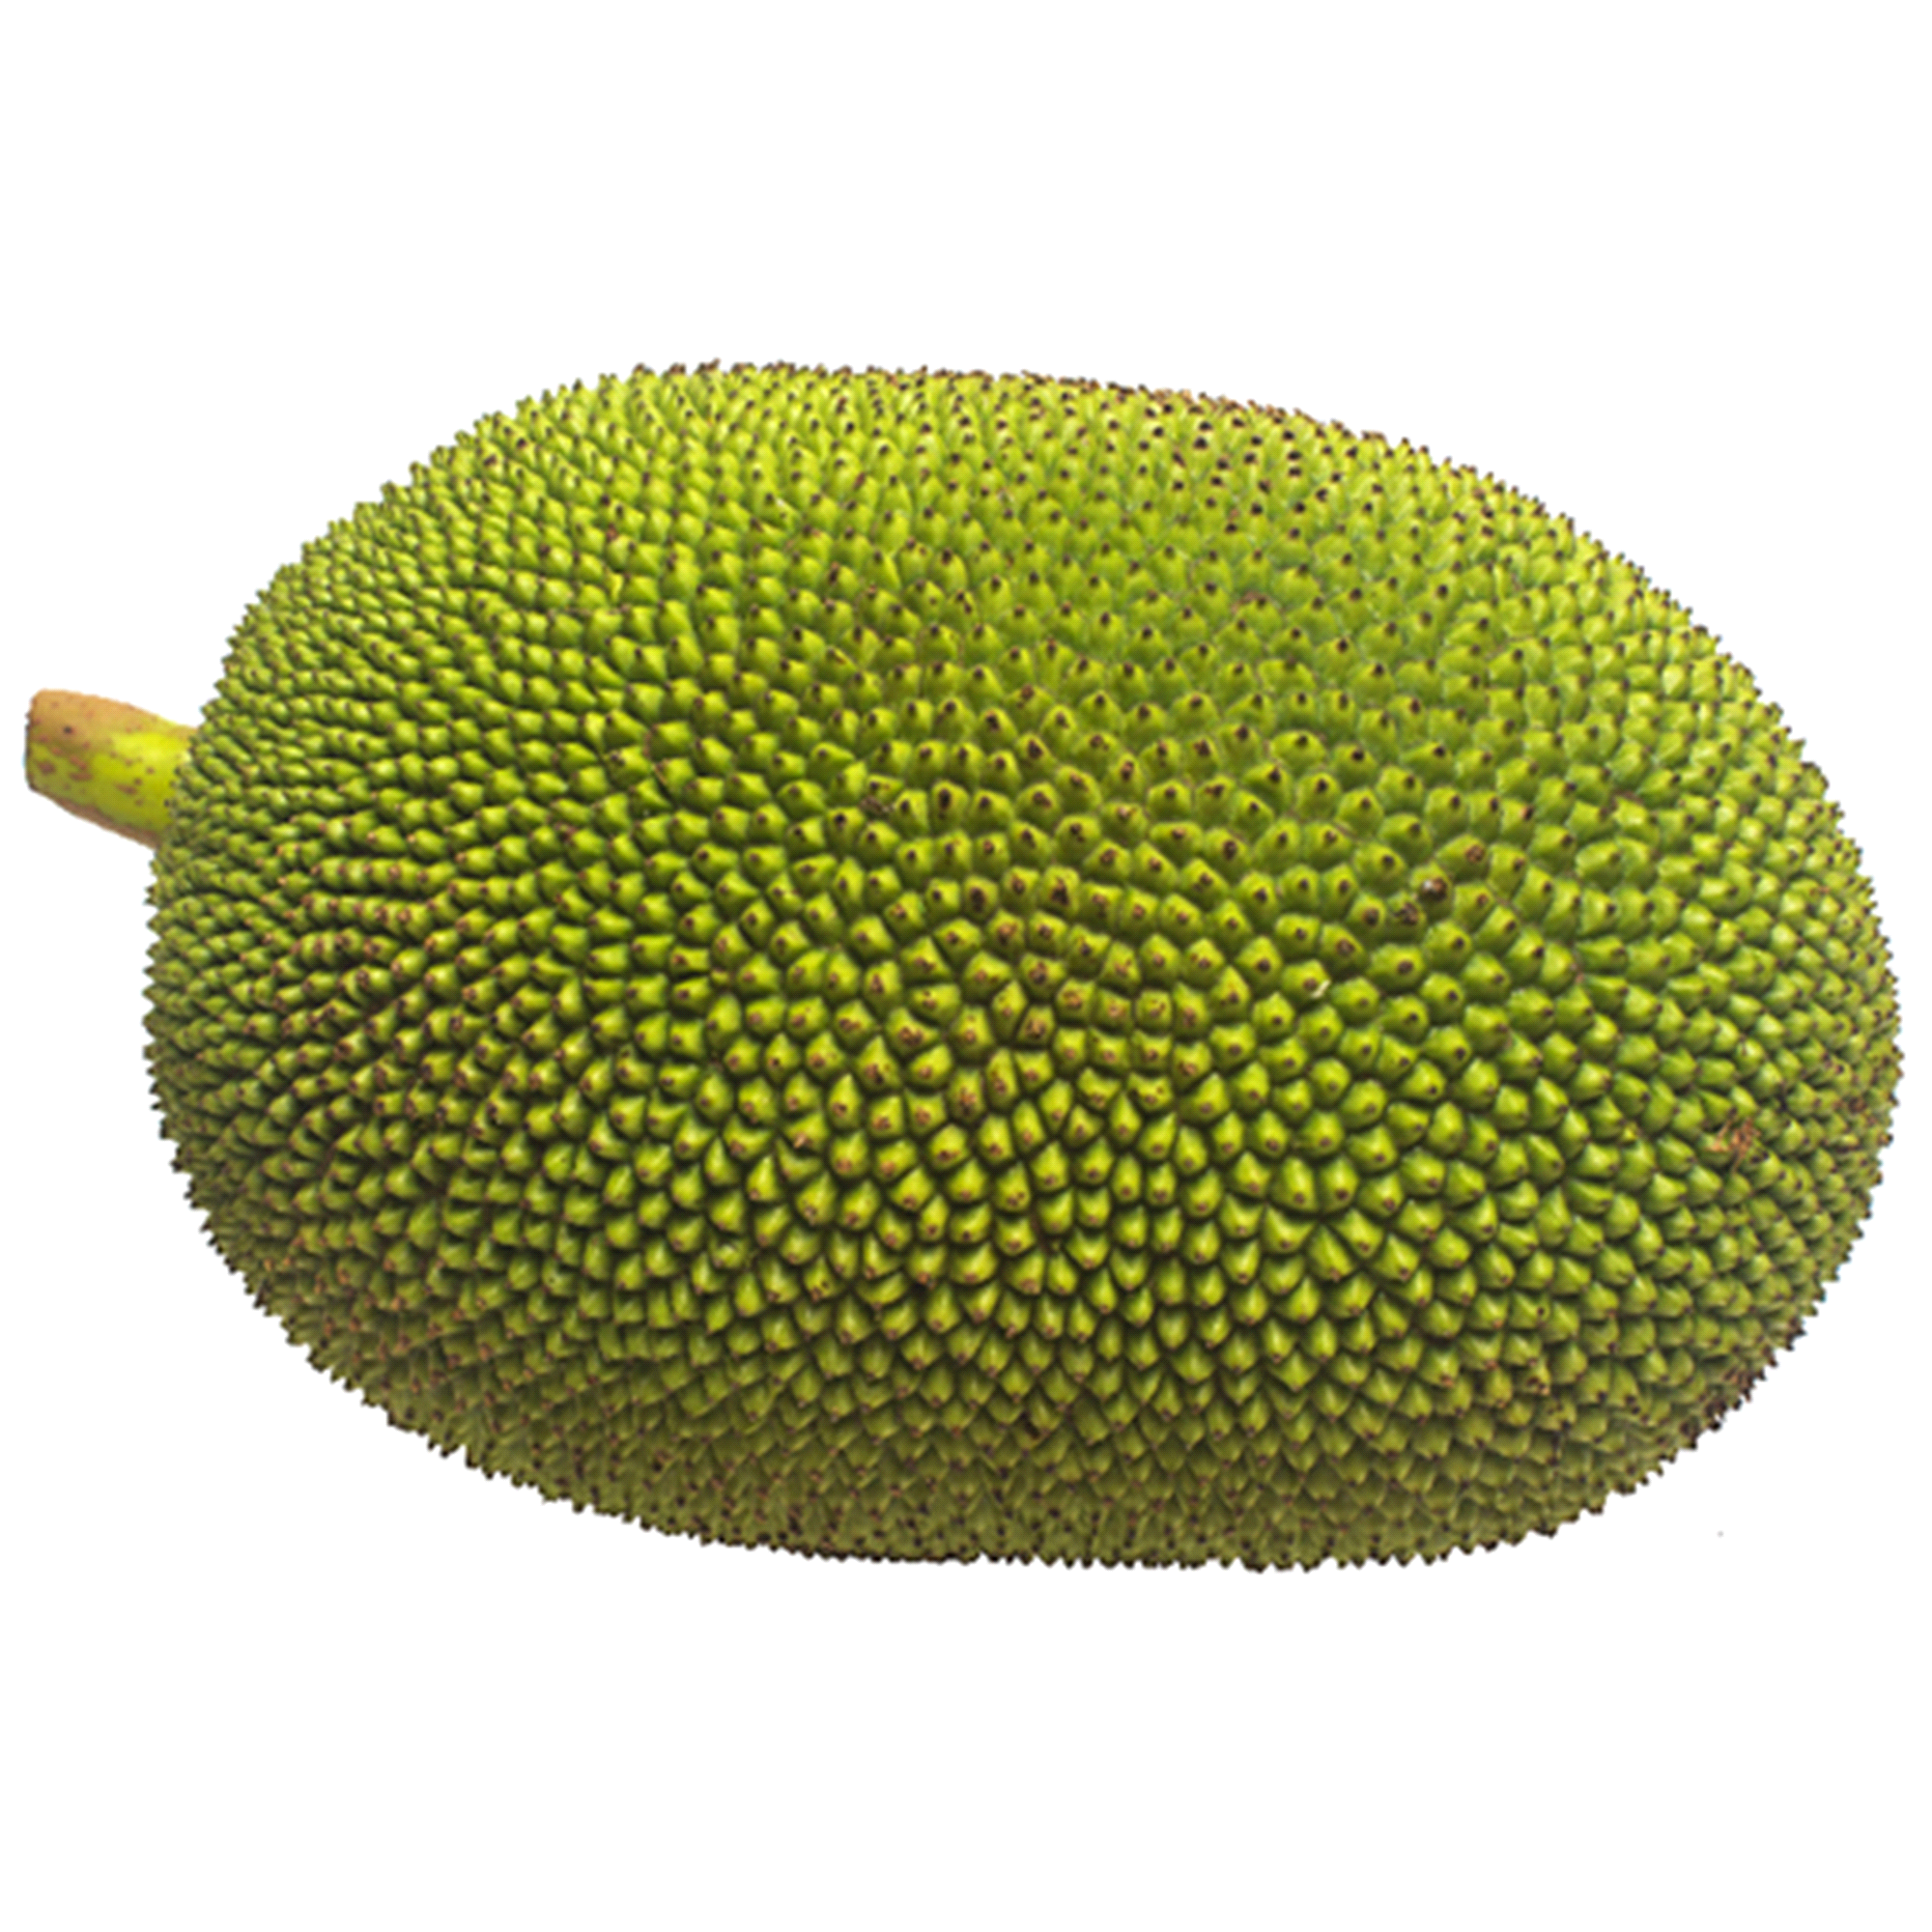 PNG Jackfruit - 70064